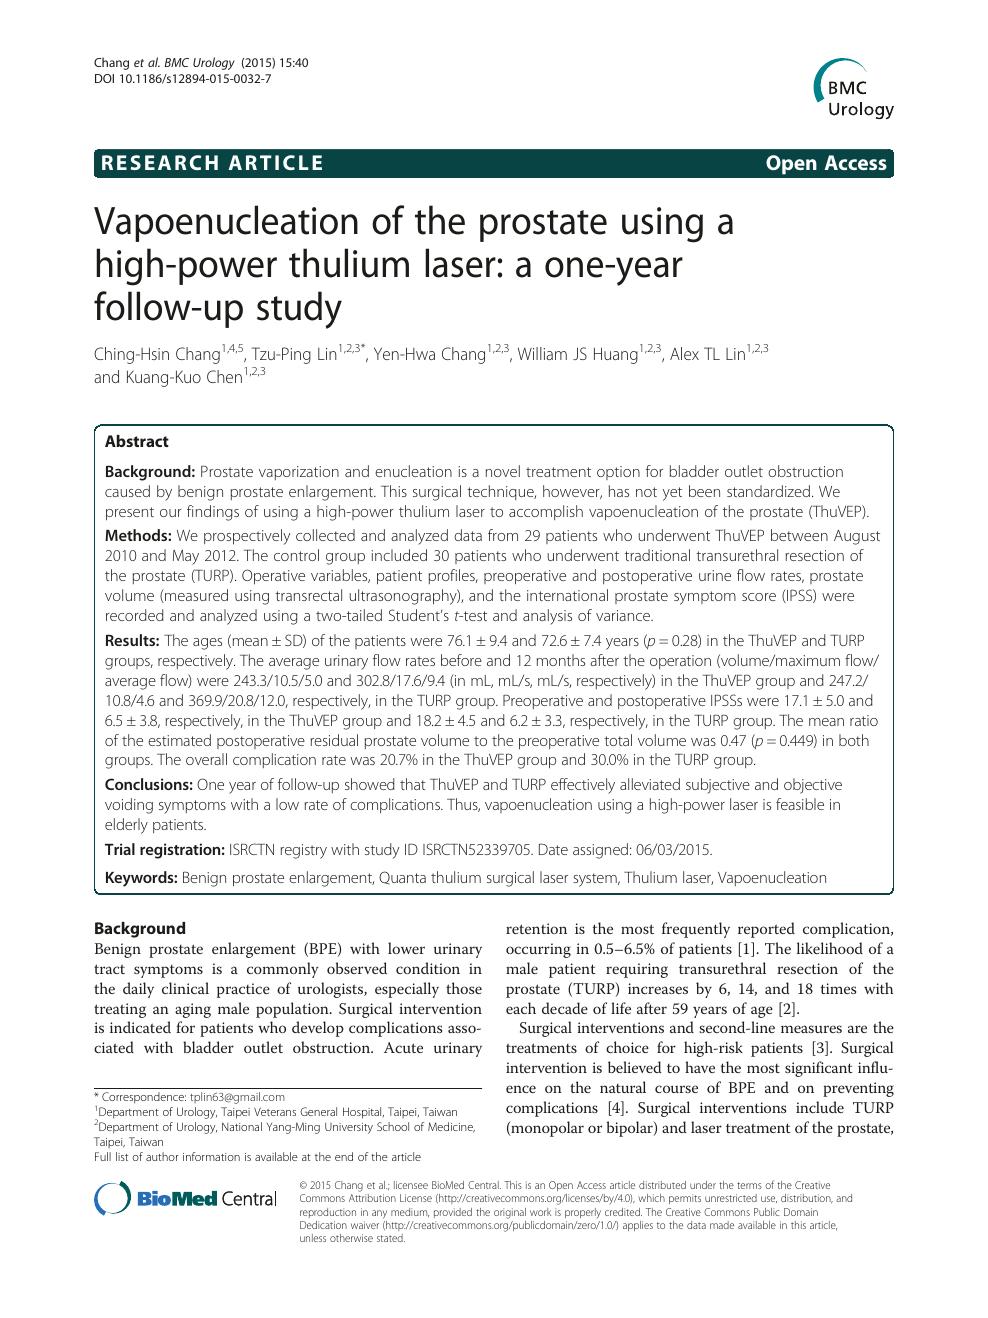 limite volume prostata per holep